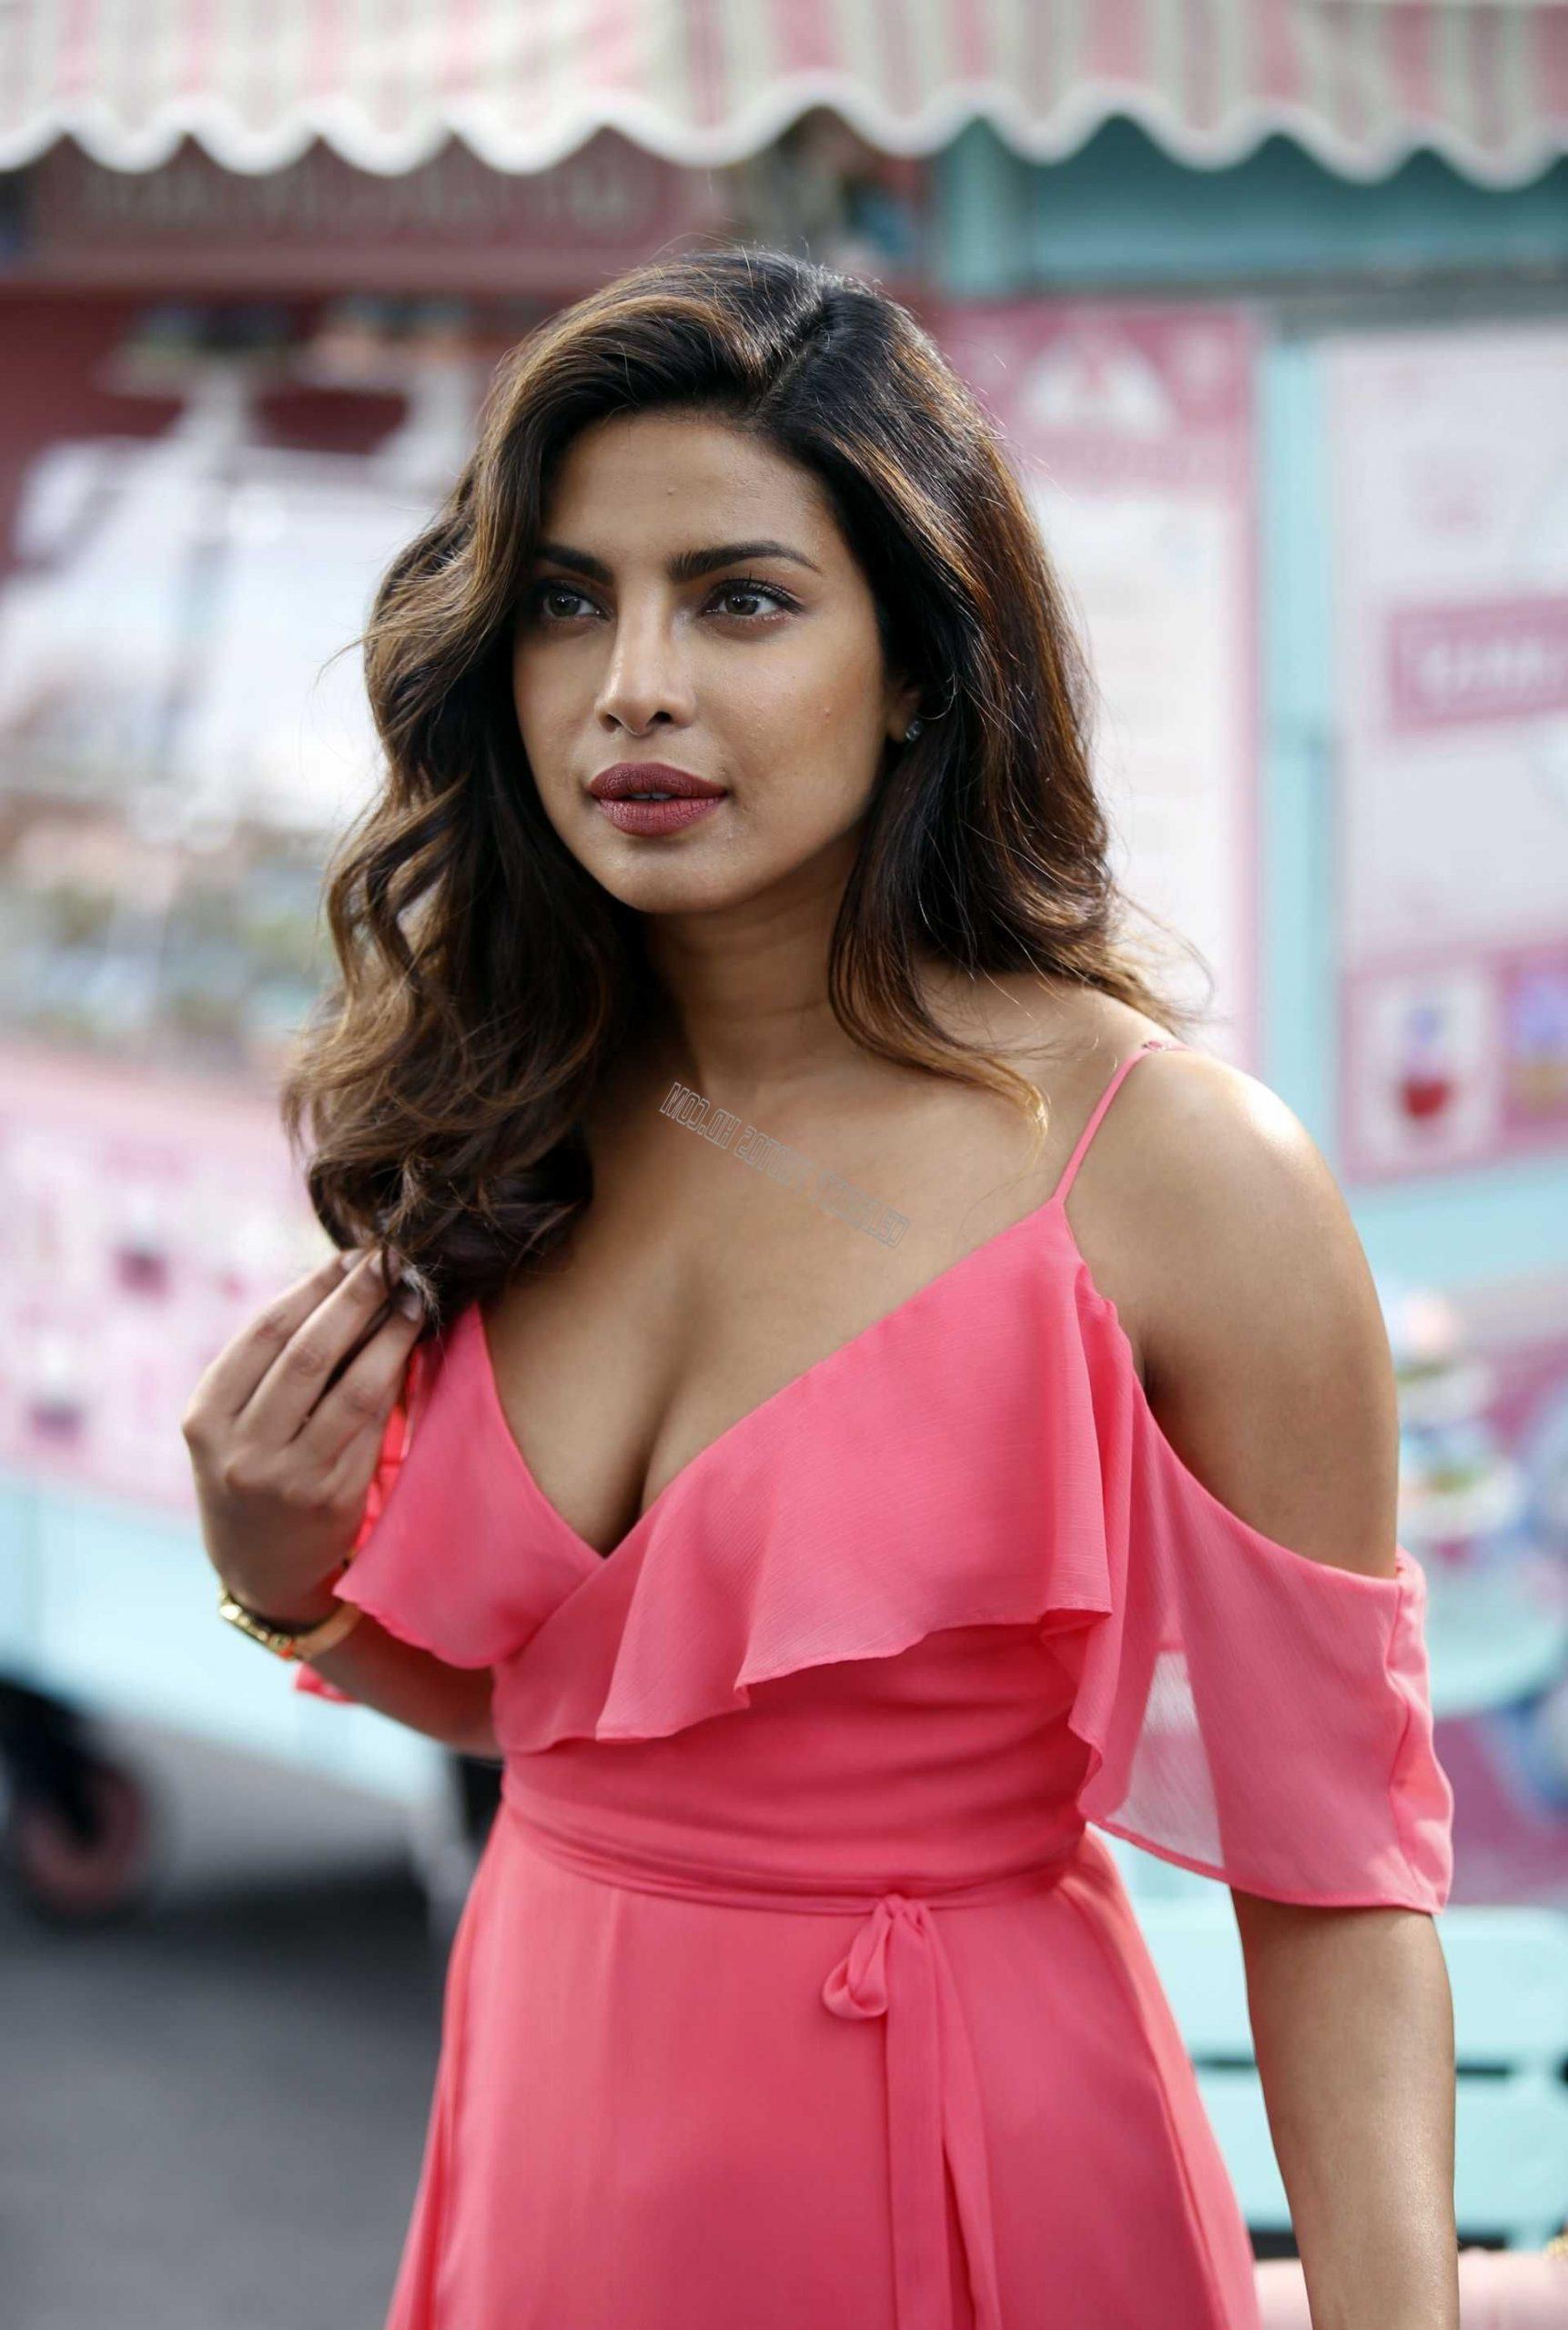 Desi Girl Priyanka Chopra Hottest Photos That Will Prove ...